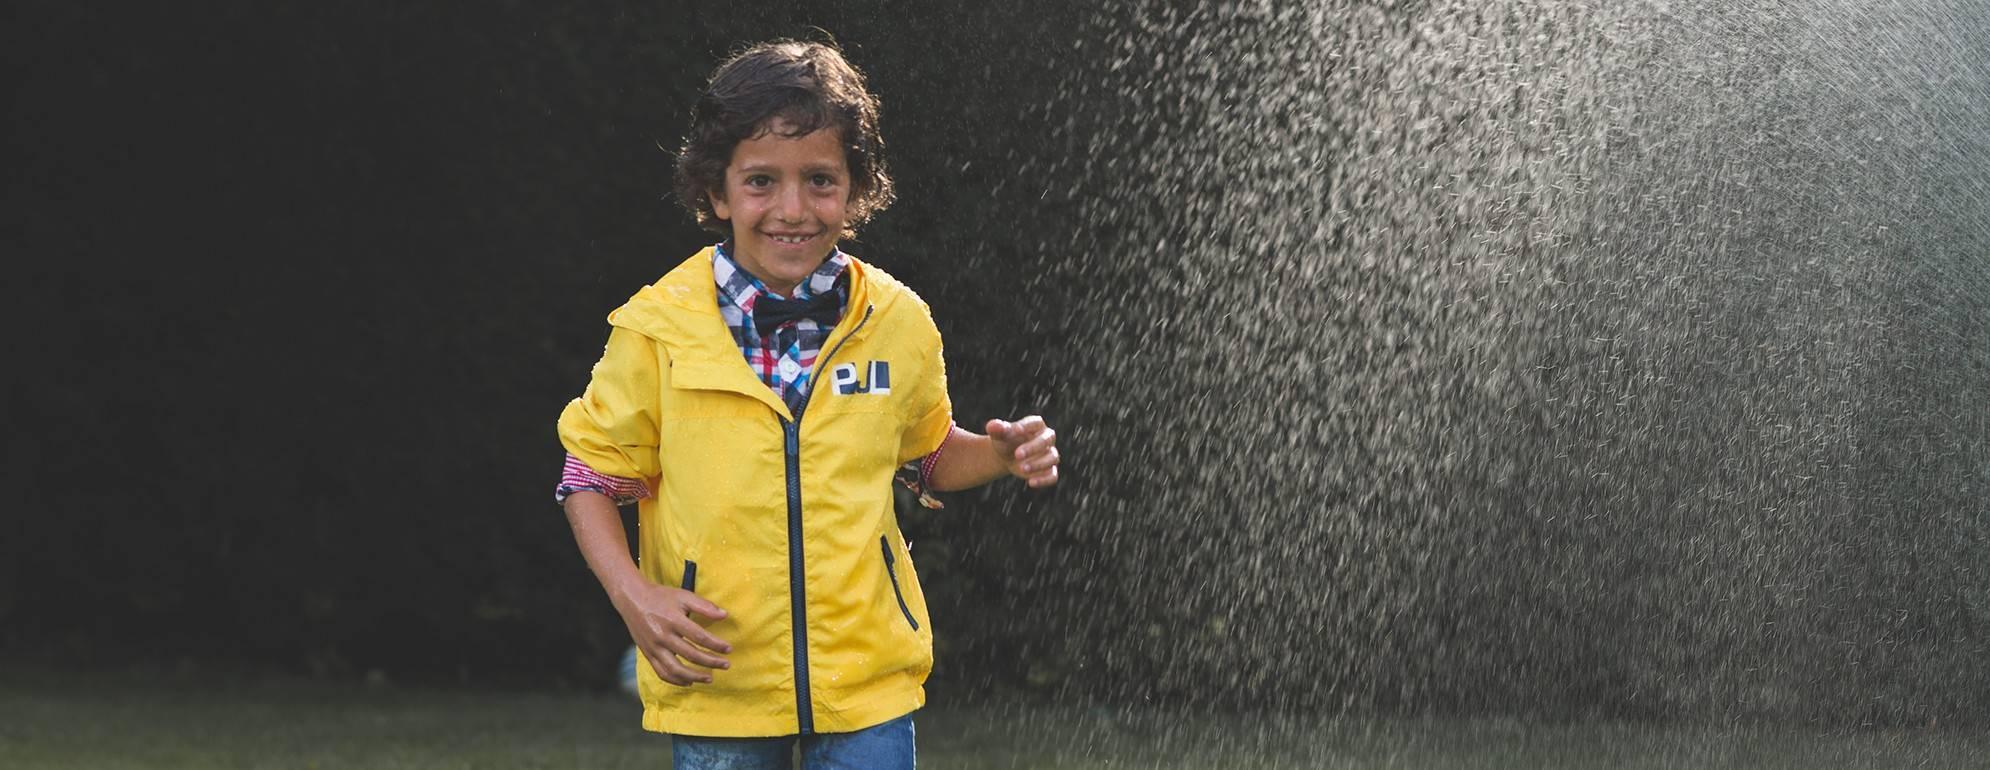 Botas de agua y calzado infantil para la lluvia KoleKole